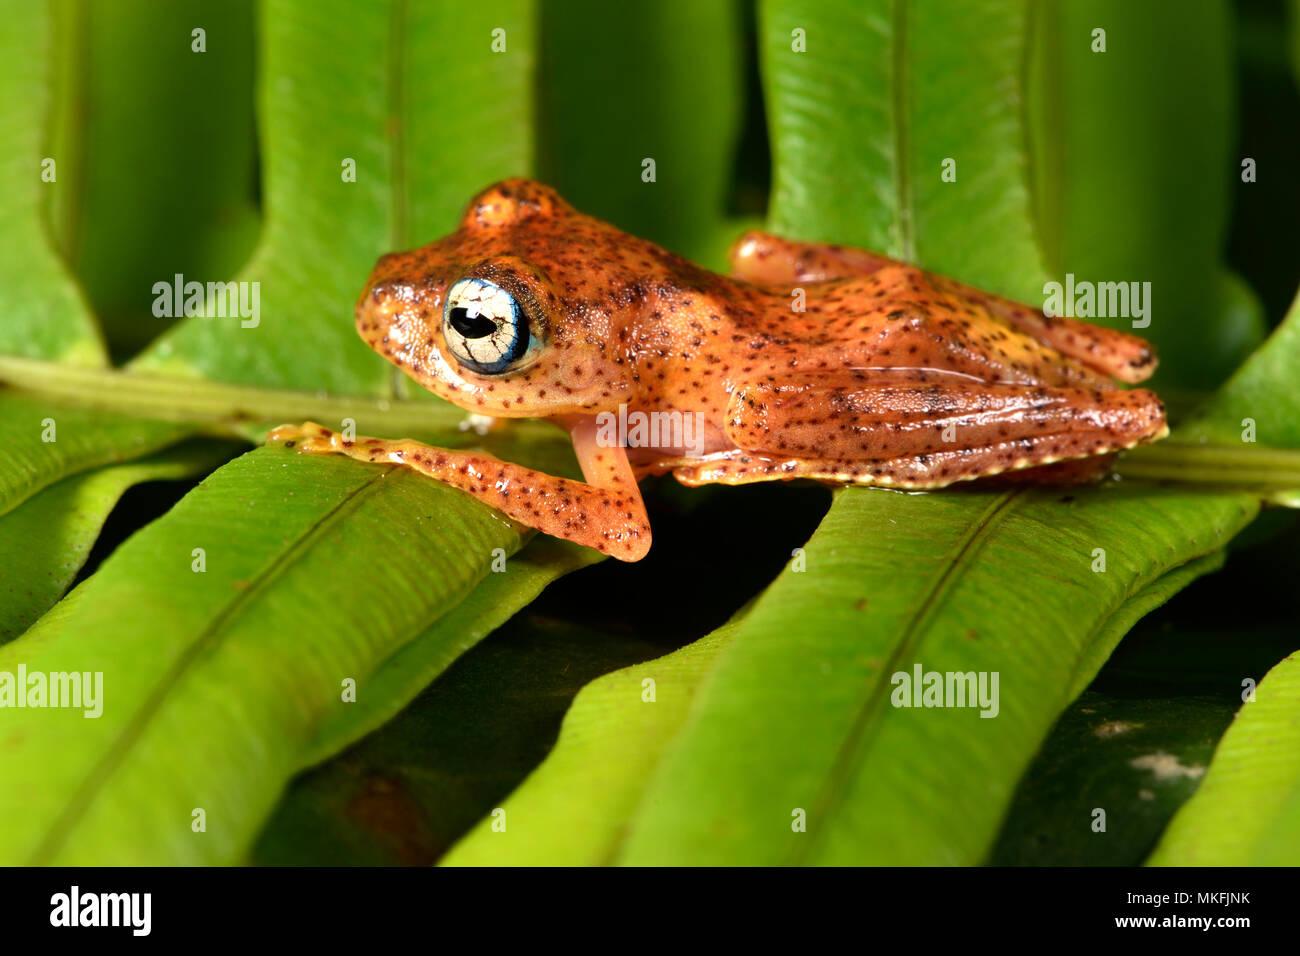 Fiery Bright-eyed Frog (Boophis pyrrhus), Andasibe, Perinet, Region Alaotra-Mangoro, Madagaskar Stockbild